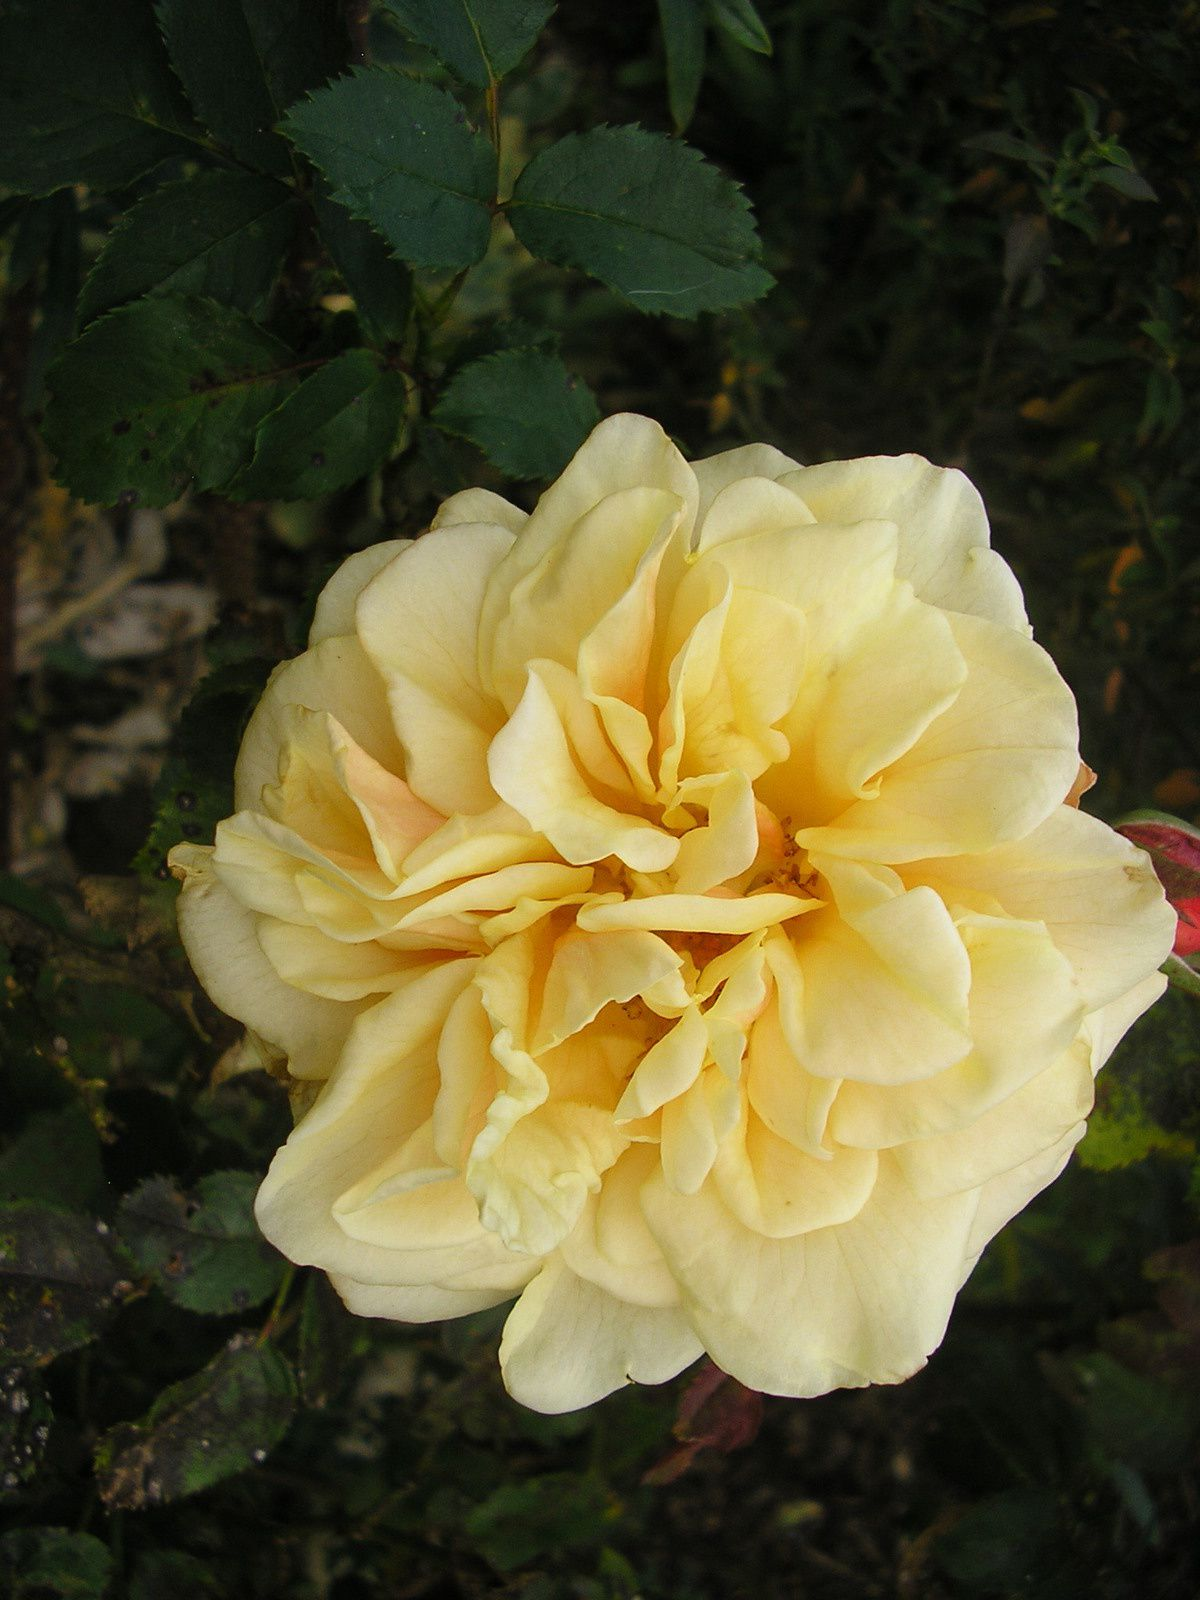 Les derniers rosiers (Manou Meilland, angéla, anisade)